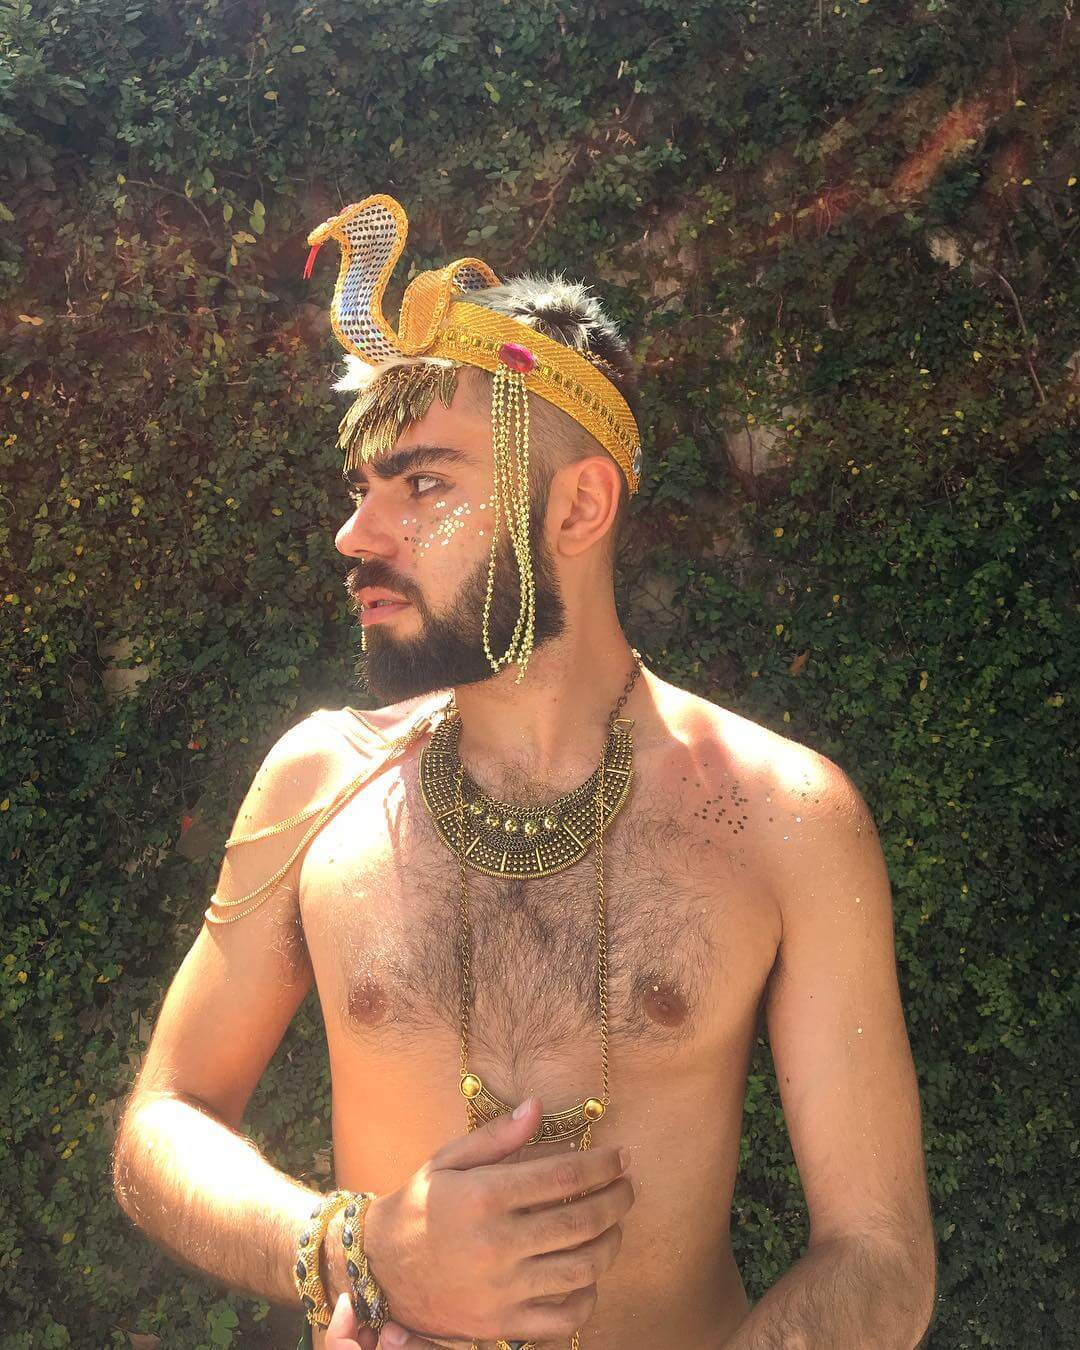 fantasias masculinas para o carnaval